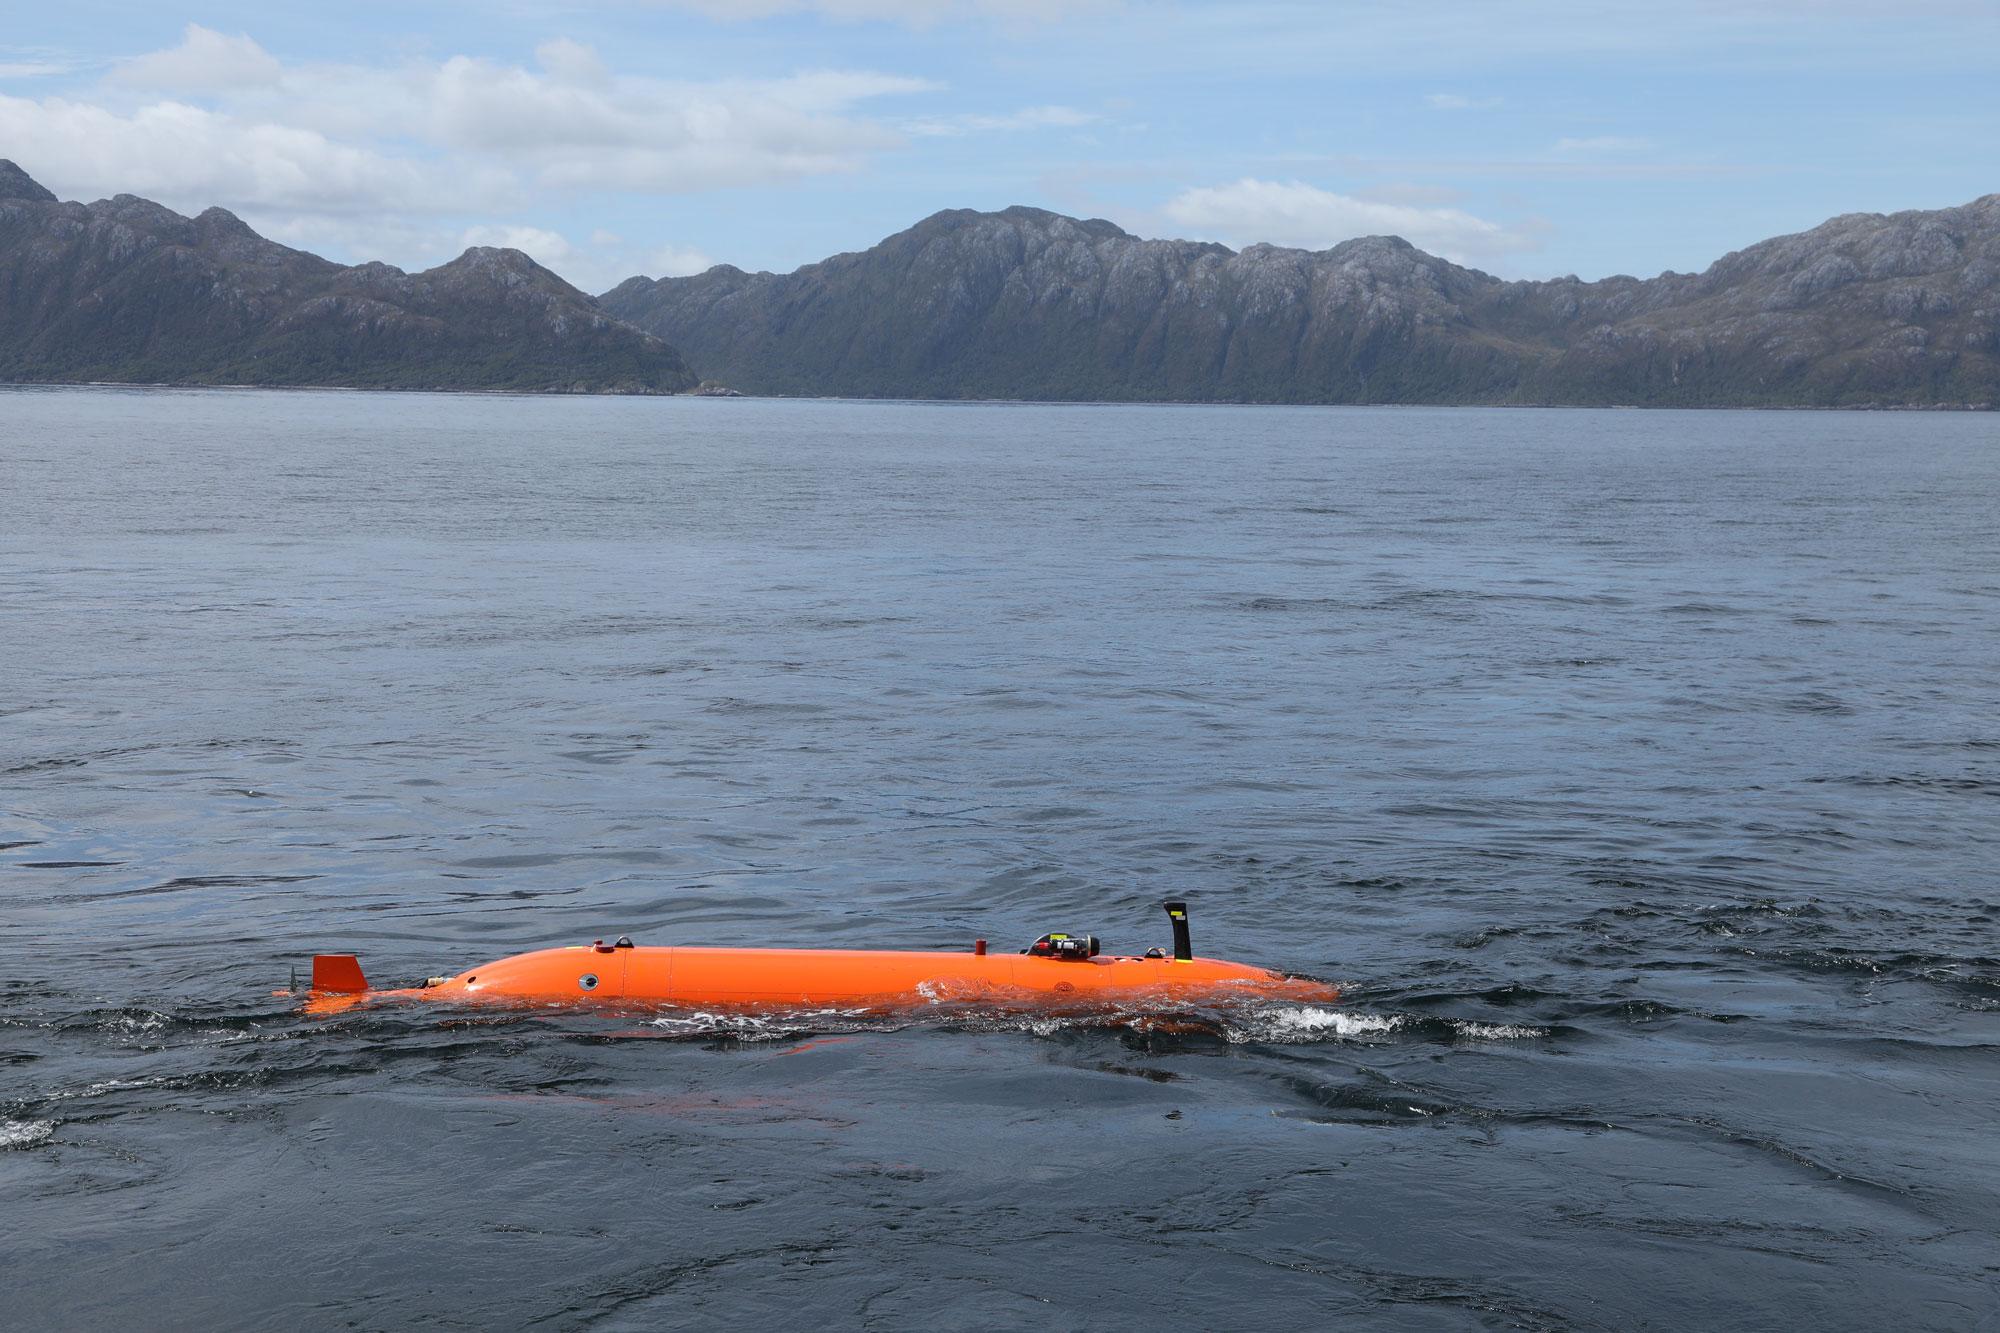 This submarine's historic tour under Thwaites Glacier will